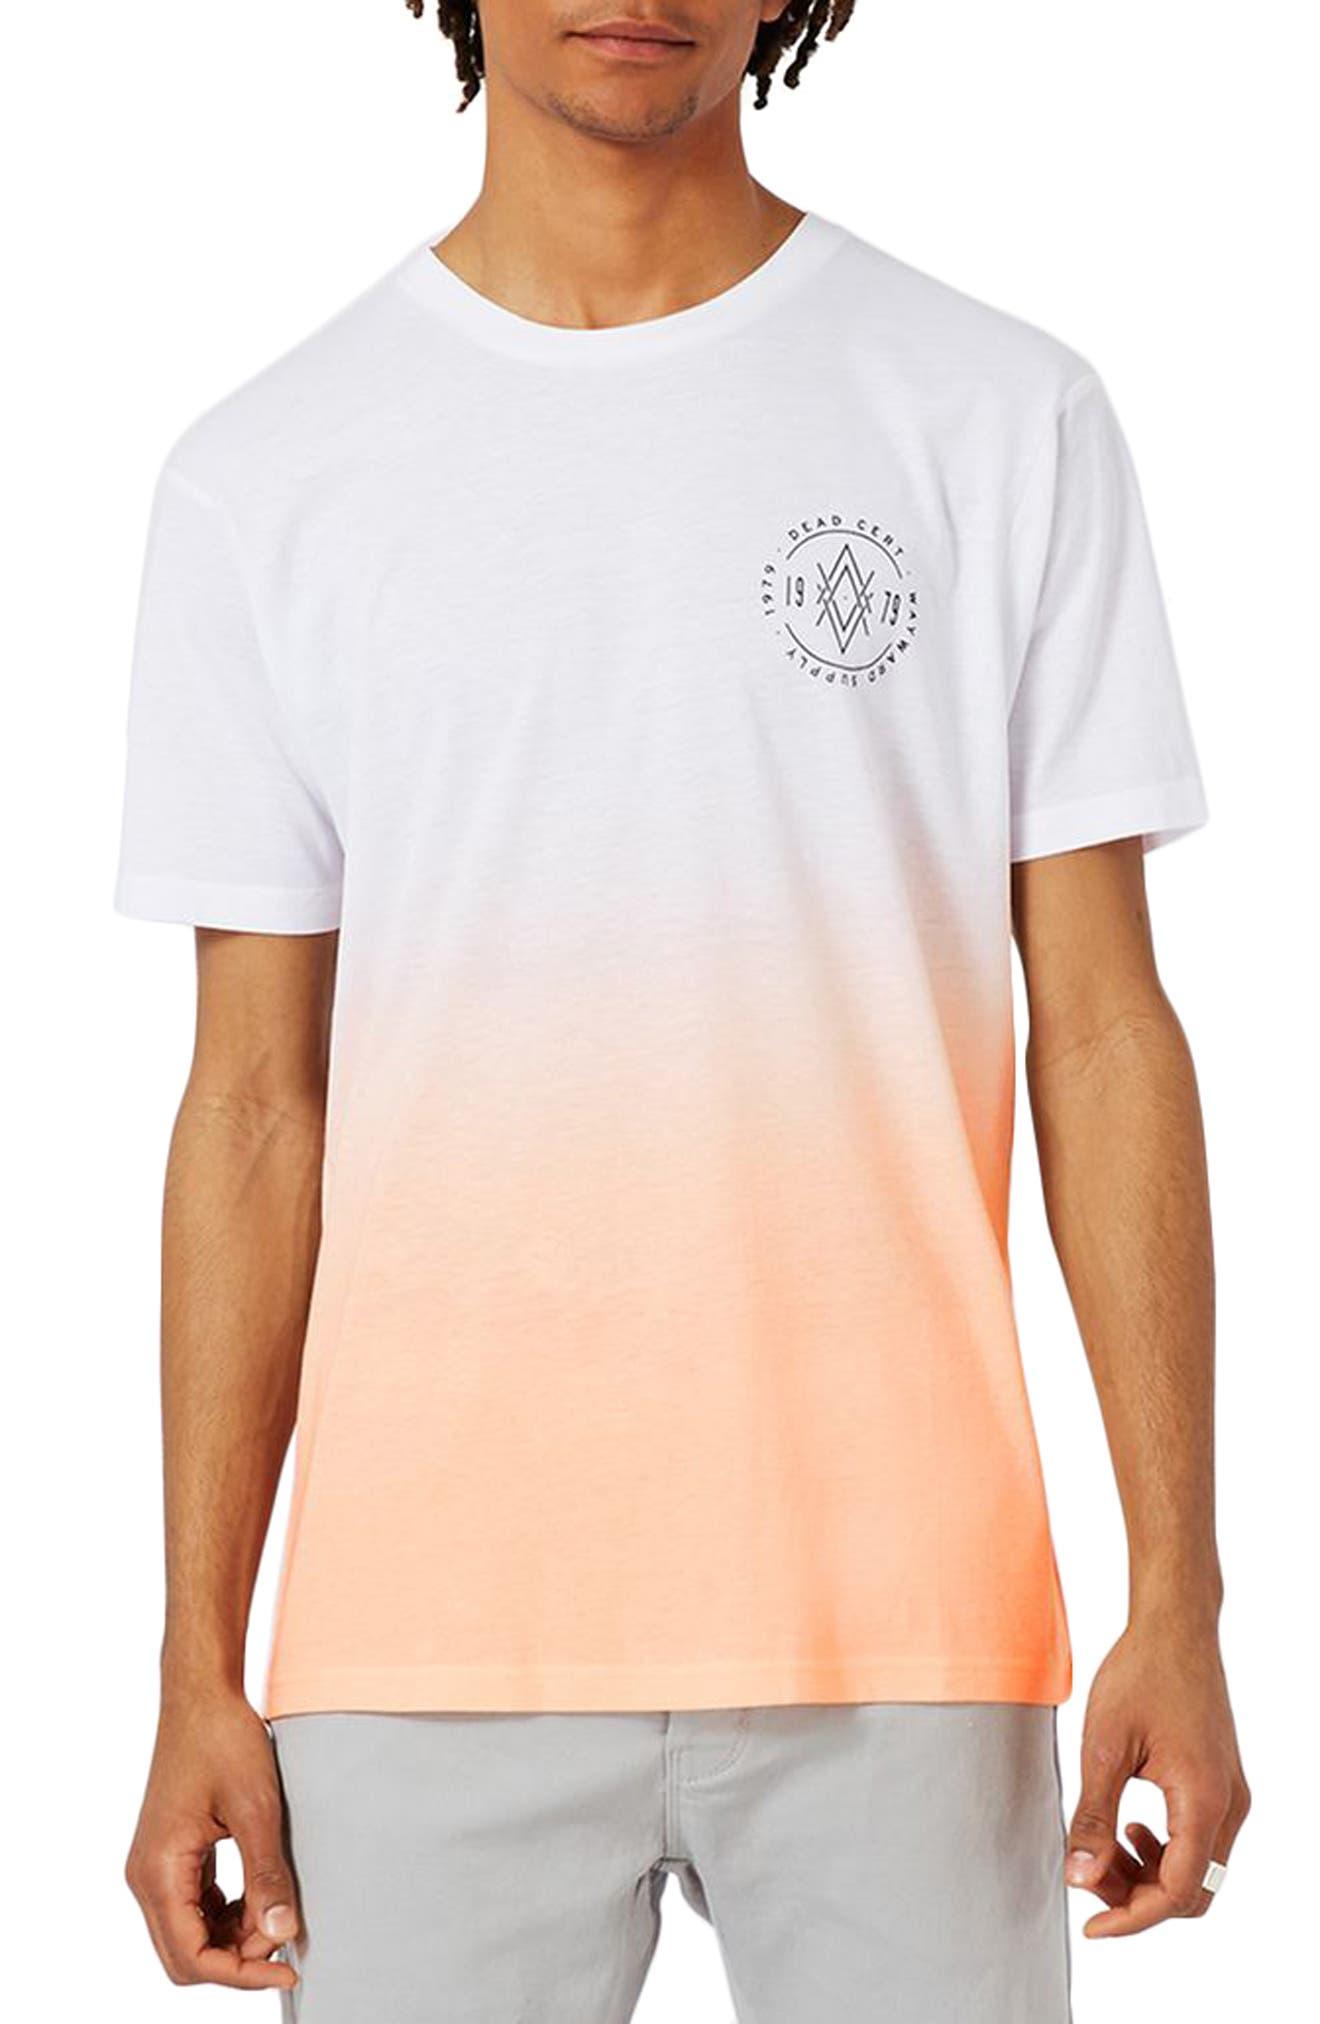 TOPMAN 1979 Print Ombré T-Shirt